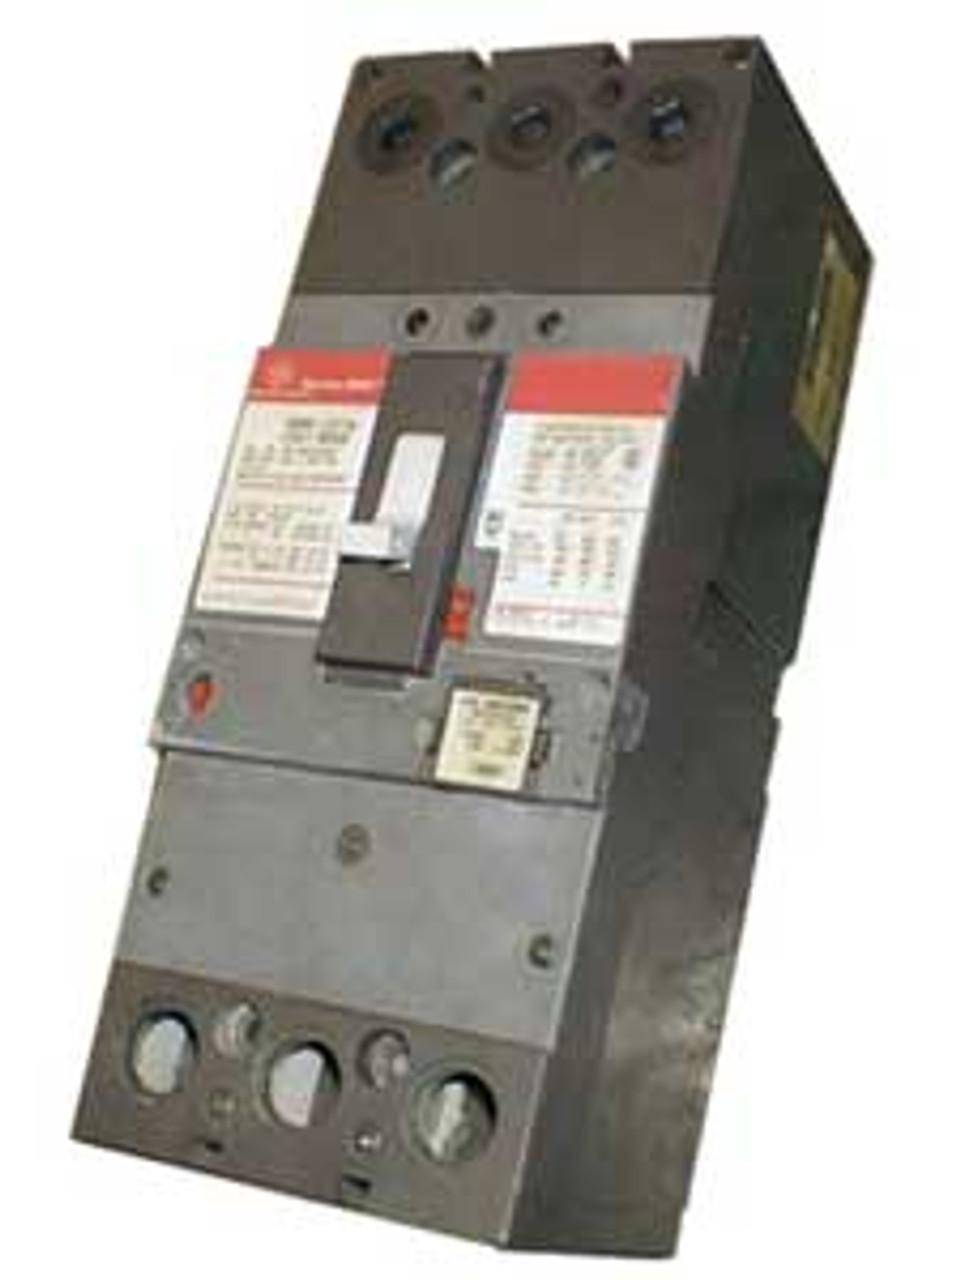 General Electric SFLA36AT0250 3P 250A 600V 225A Trip Circuit Breaker - New